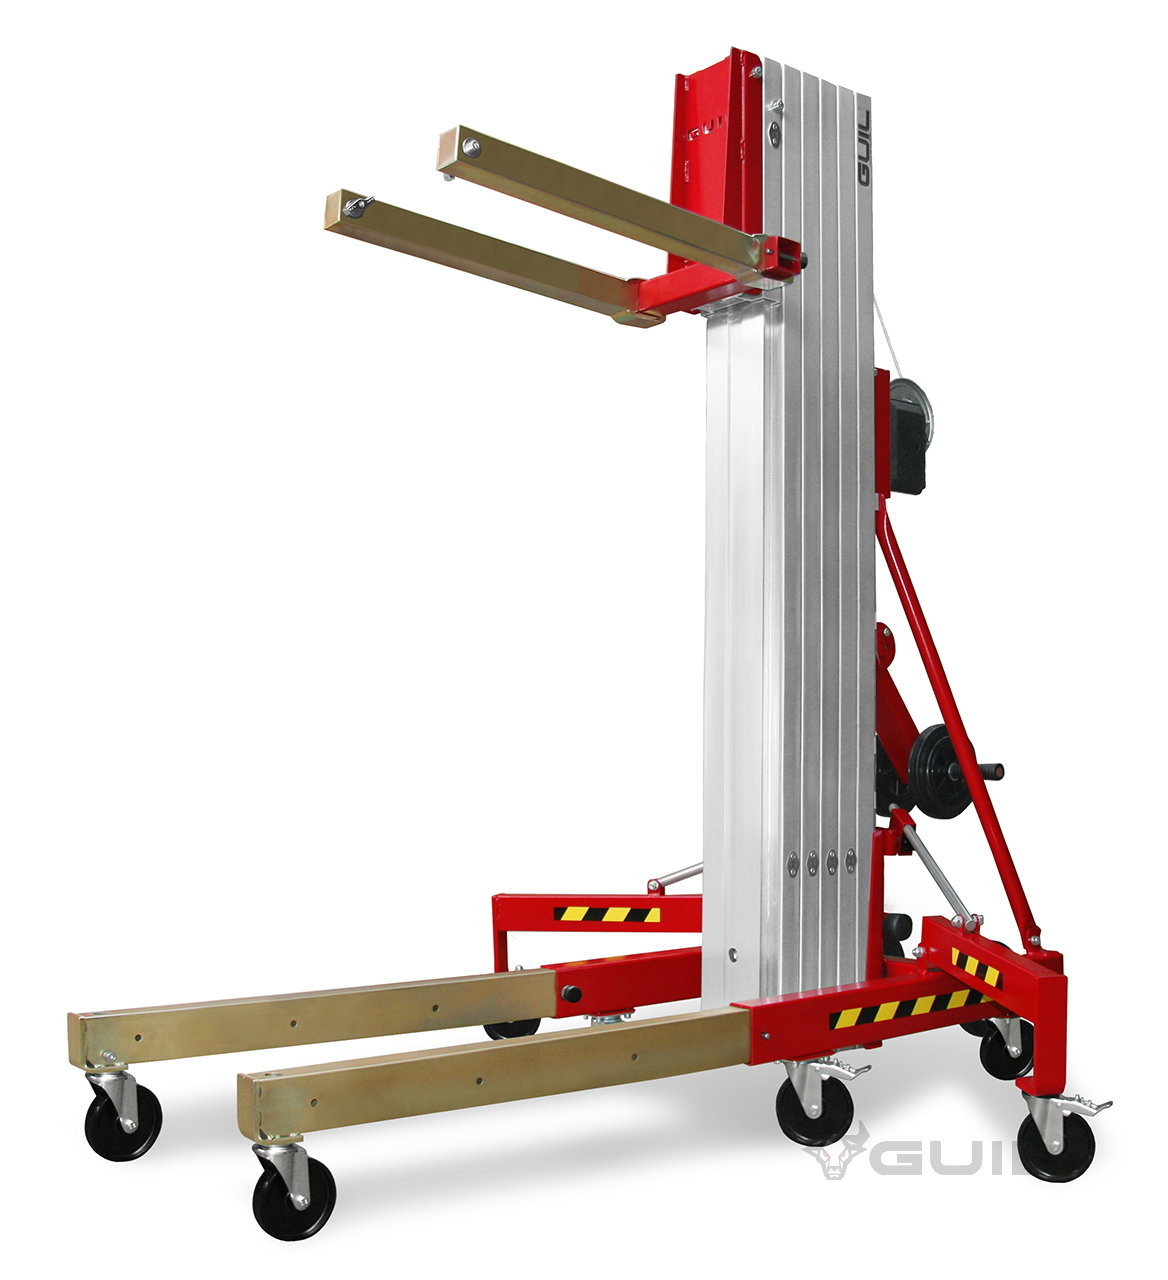 Kanaallift 5,00 m 300 kg (dutch) (1)